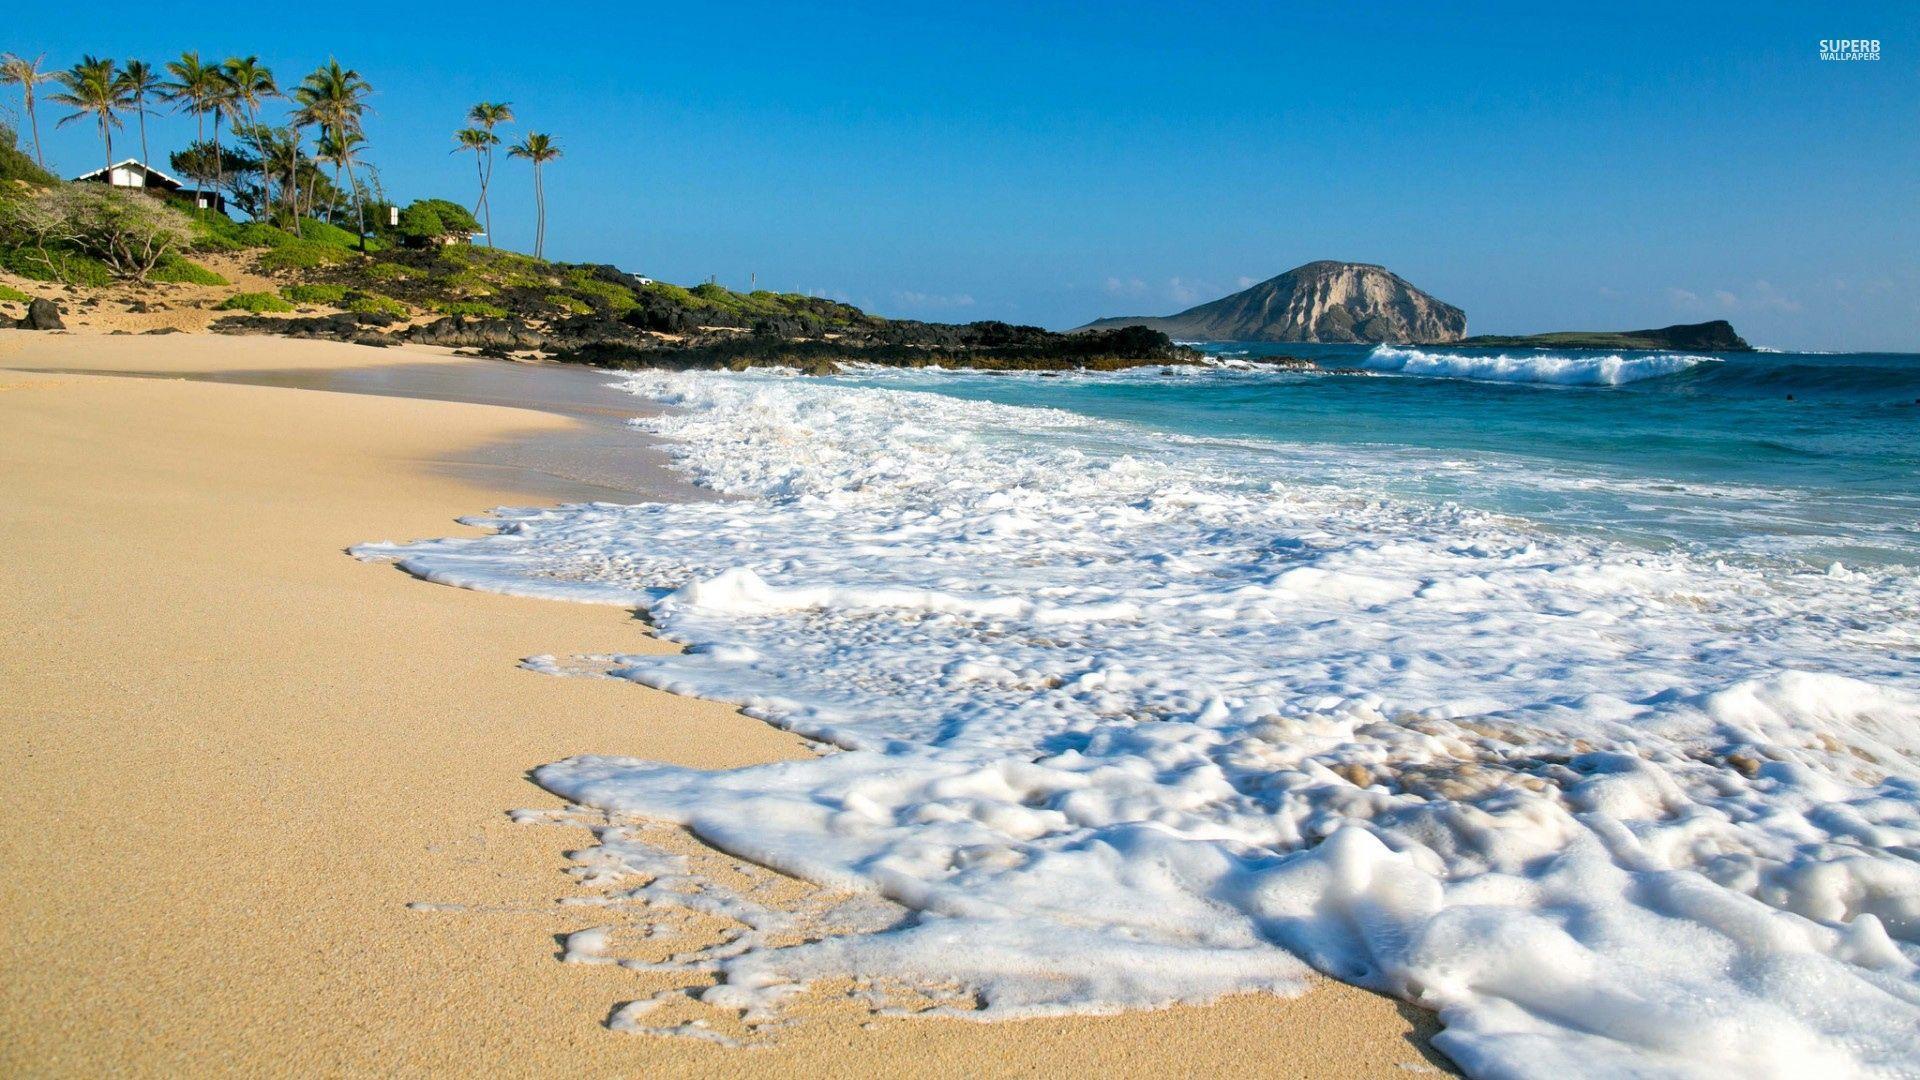 Ocean Beach Desktop Wallpapers Top Free Ocean Beach